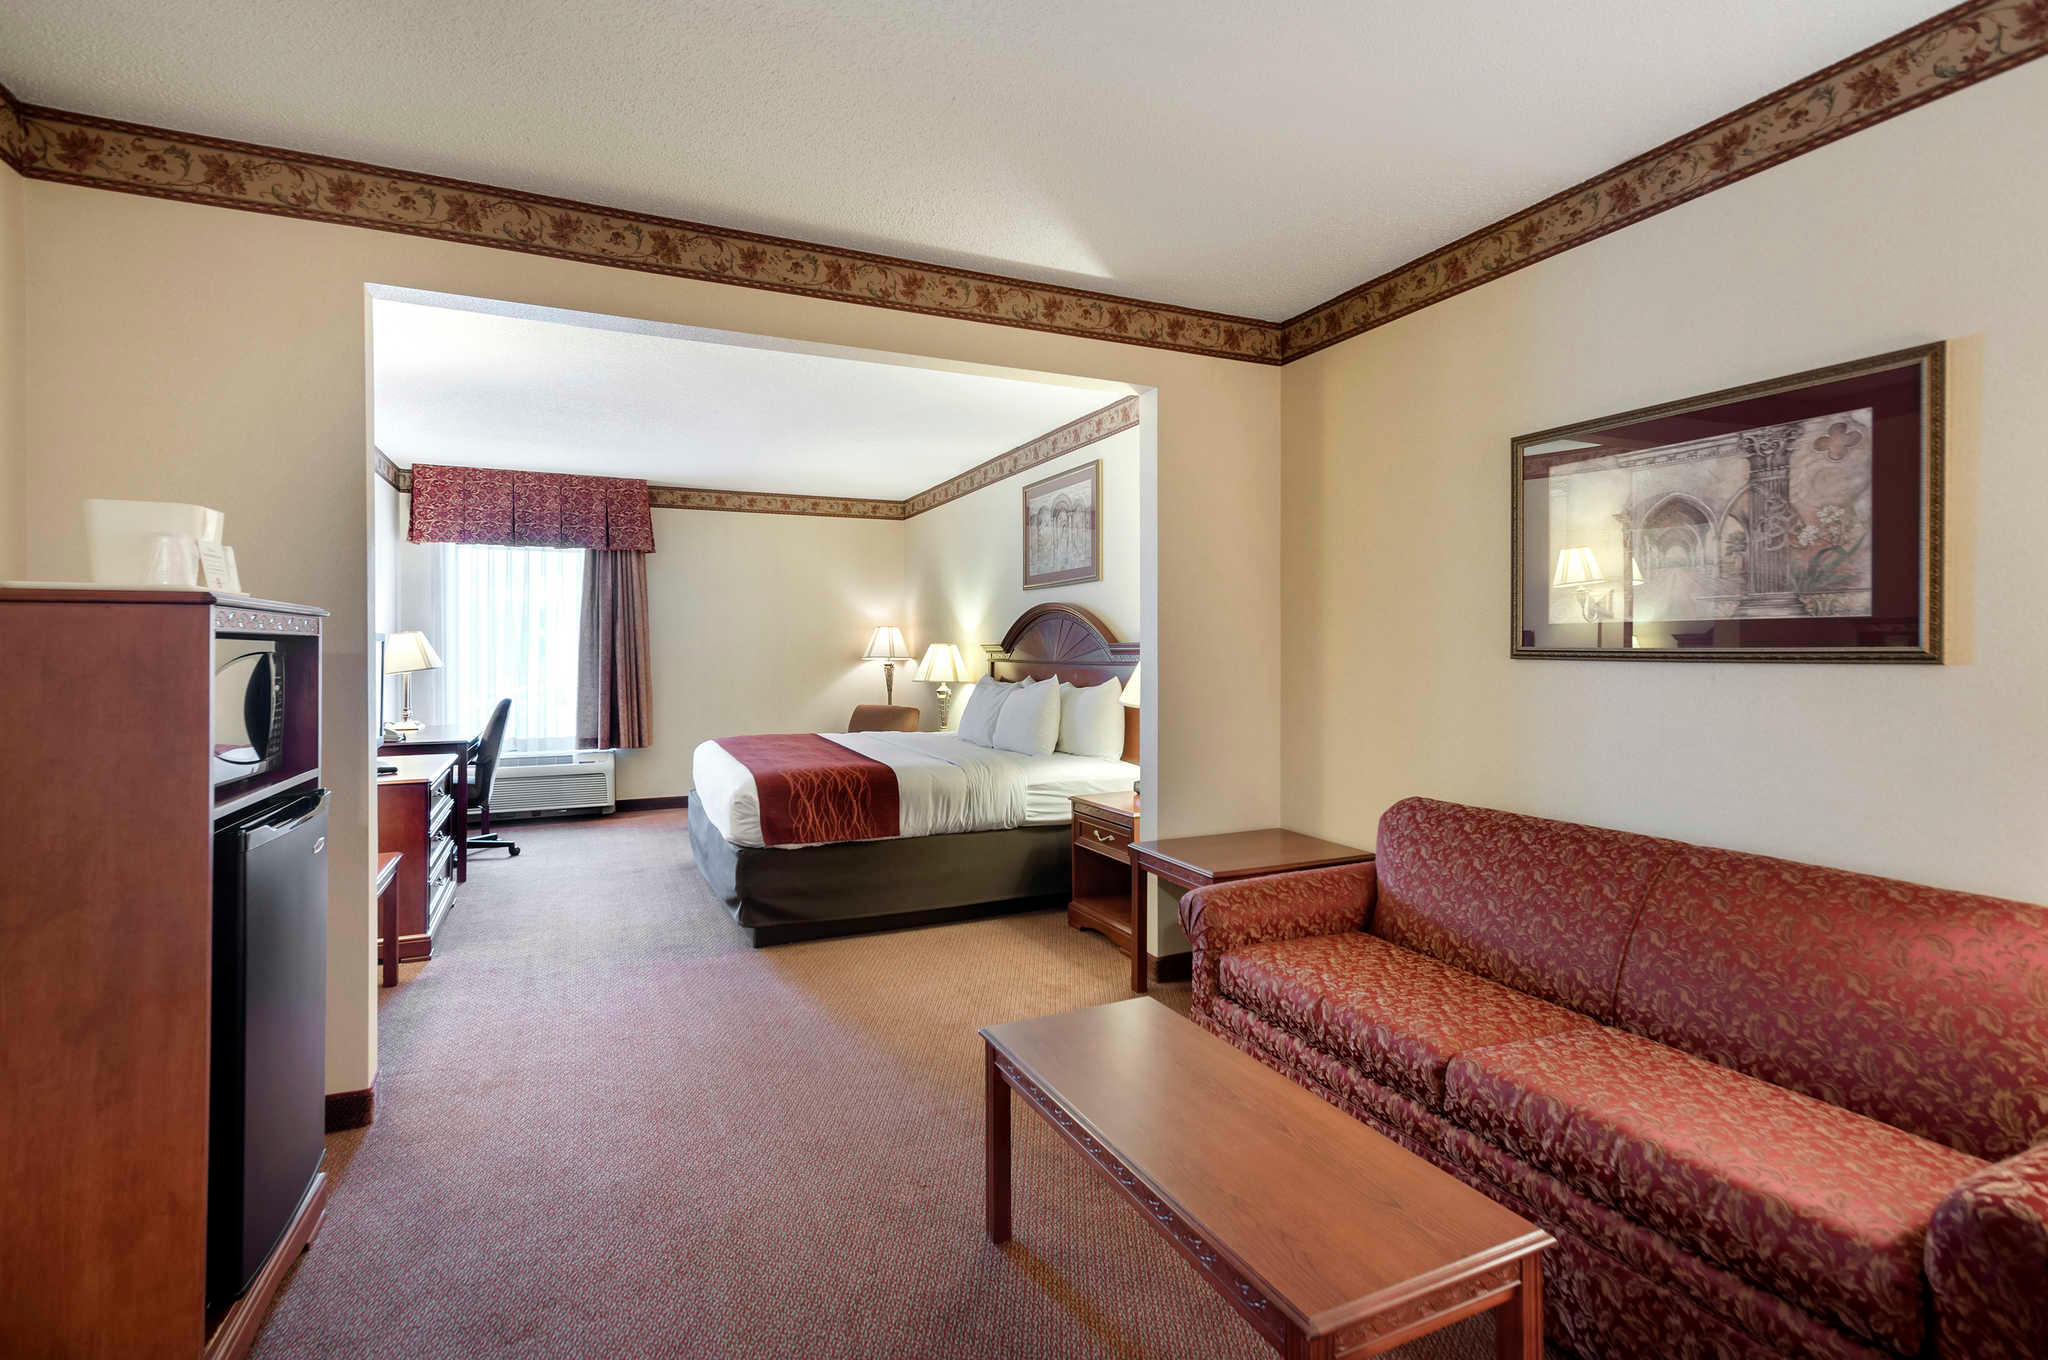 Comfort Inn & Suites Edgewood - Aberdeen image 14